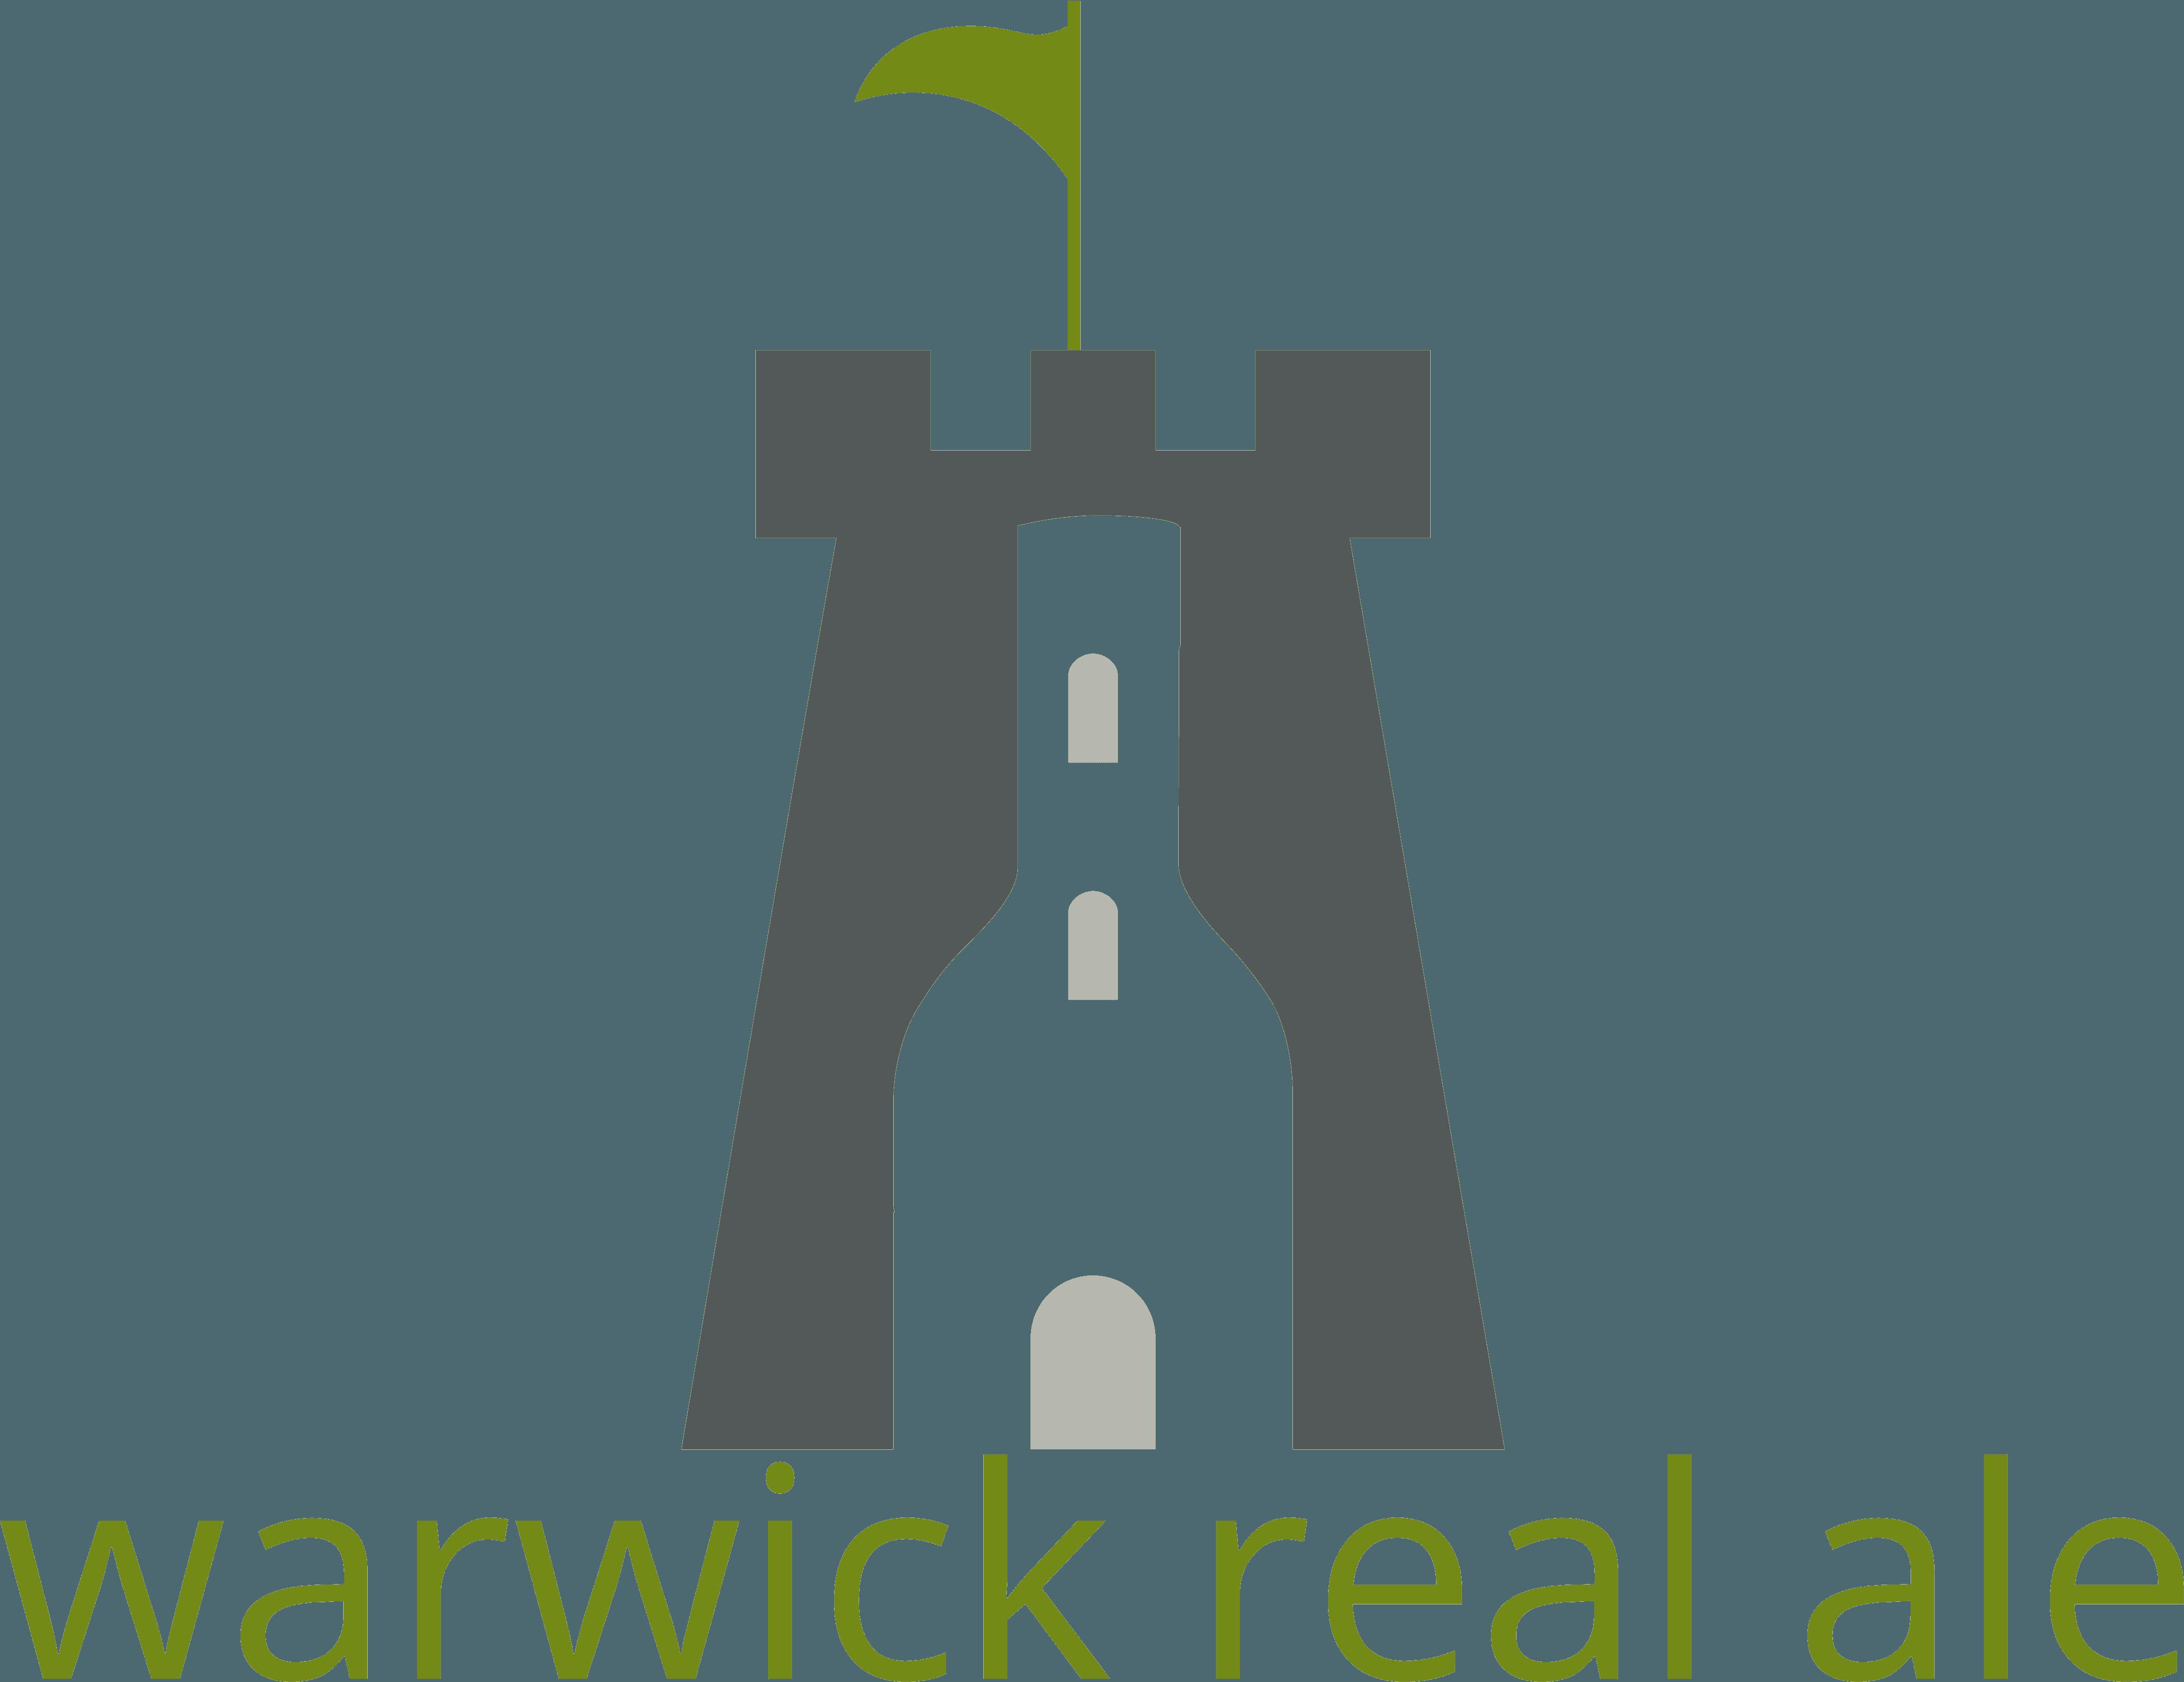 Warwick real ale logo